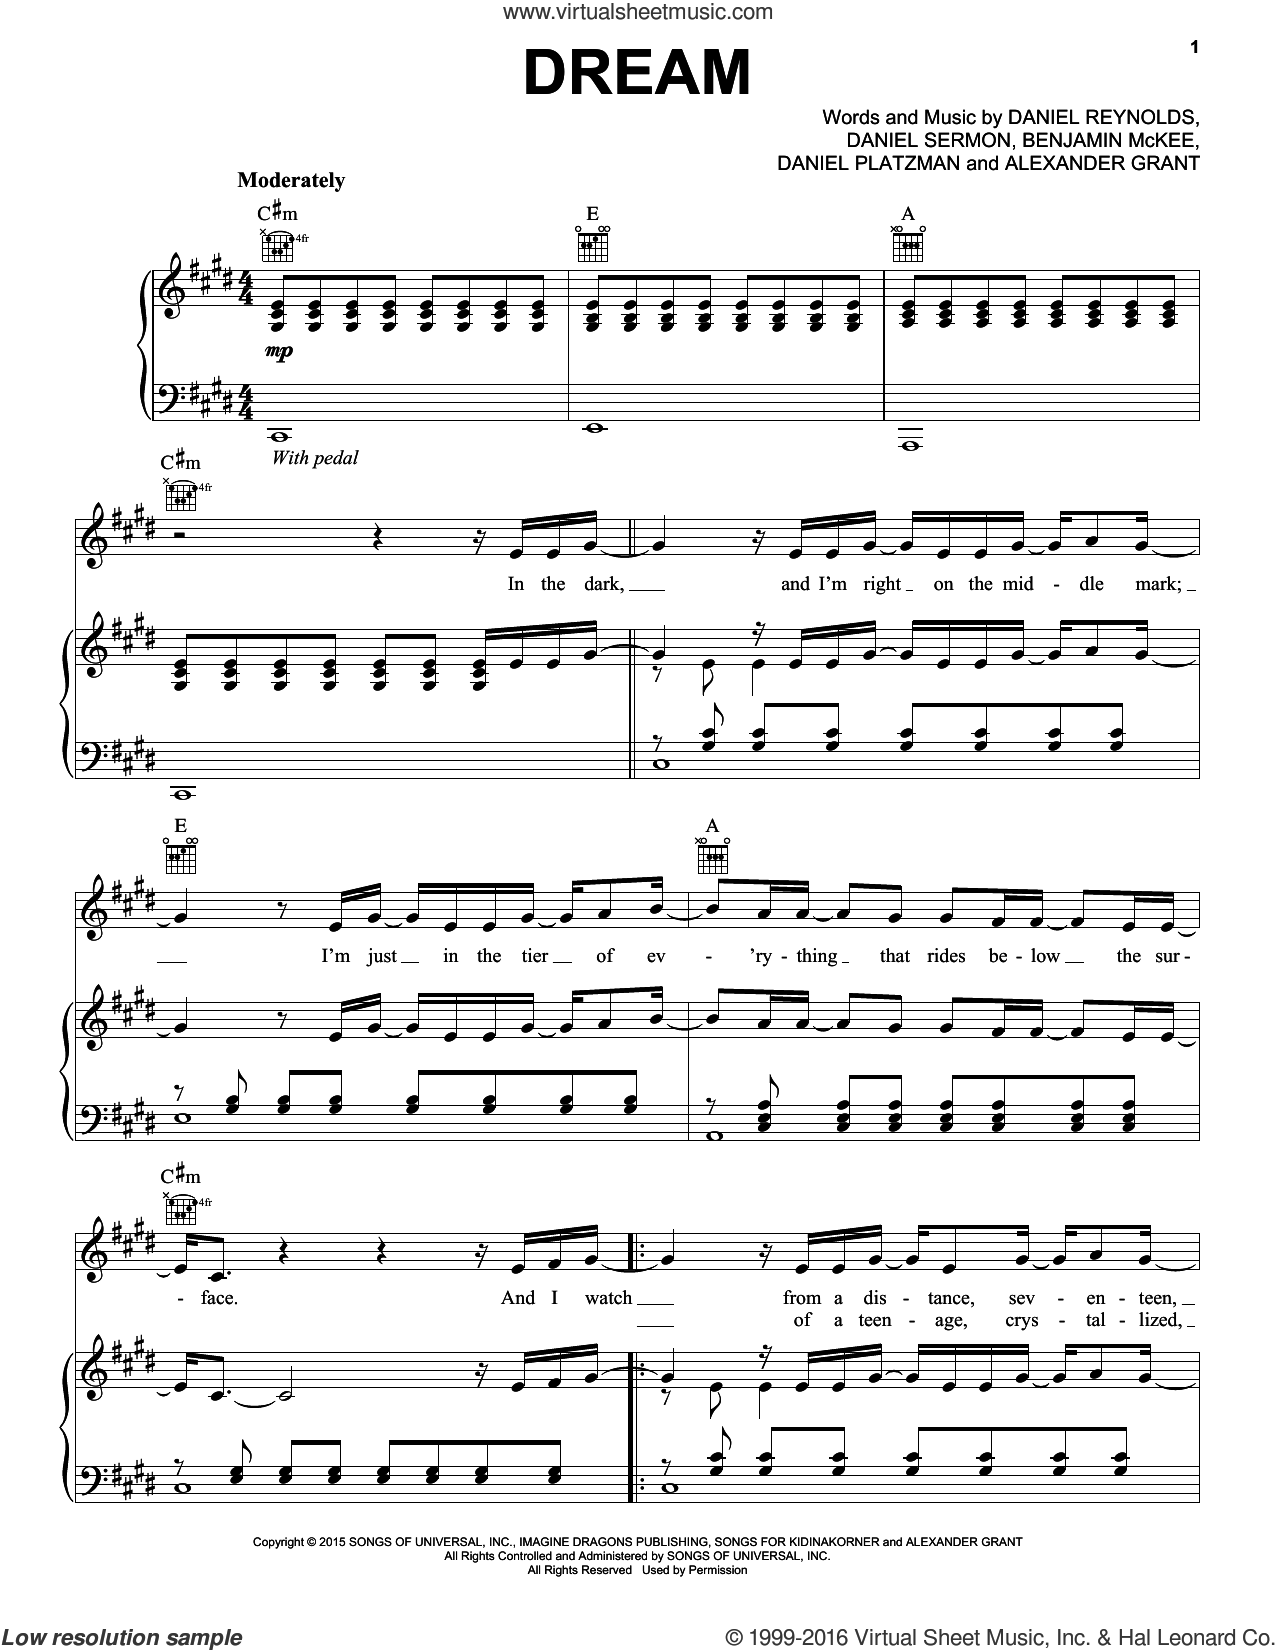 Dream sheet music for voice, piano or guitar by Imagine Dragons, Alexander Grant, Benjamin McKee, Daniel Platzman, Daniel Reynolds and Daniel Sermon, intermediate skill level